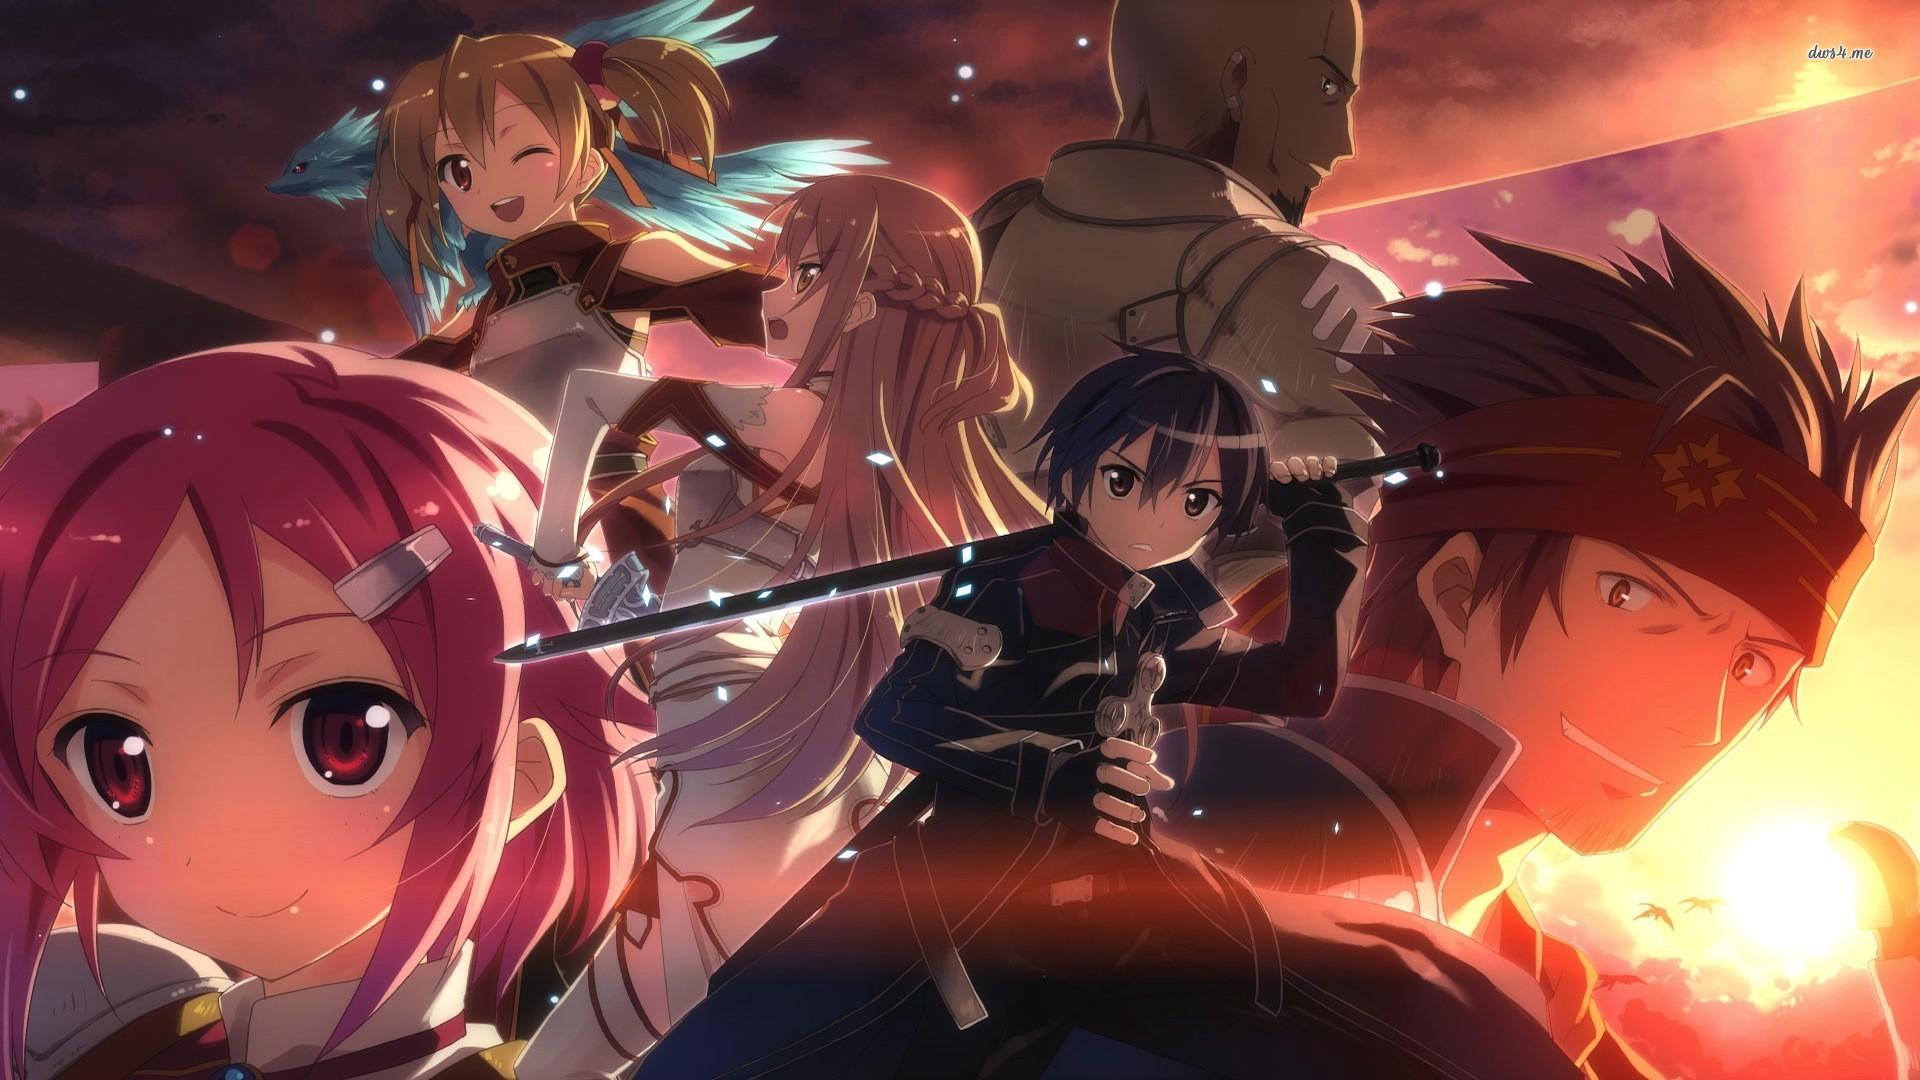 [48+] Sword Art Online Wallpaper 1366x768 on WallpaperSafari